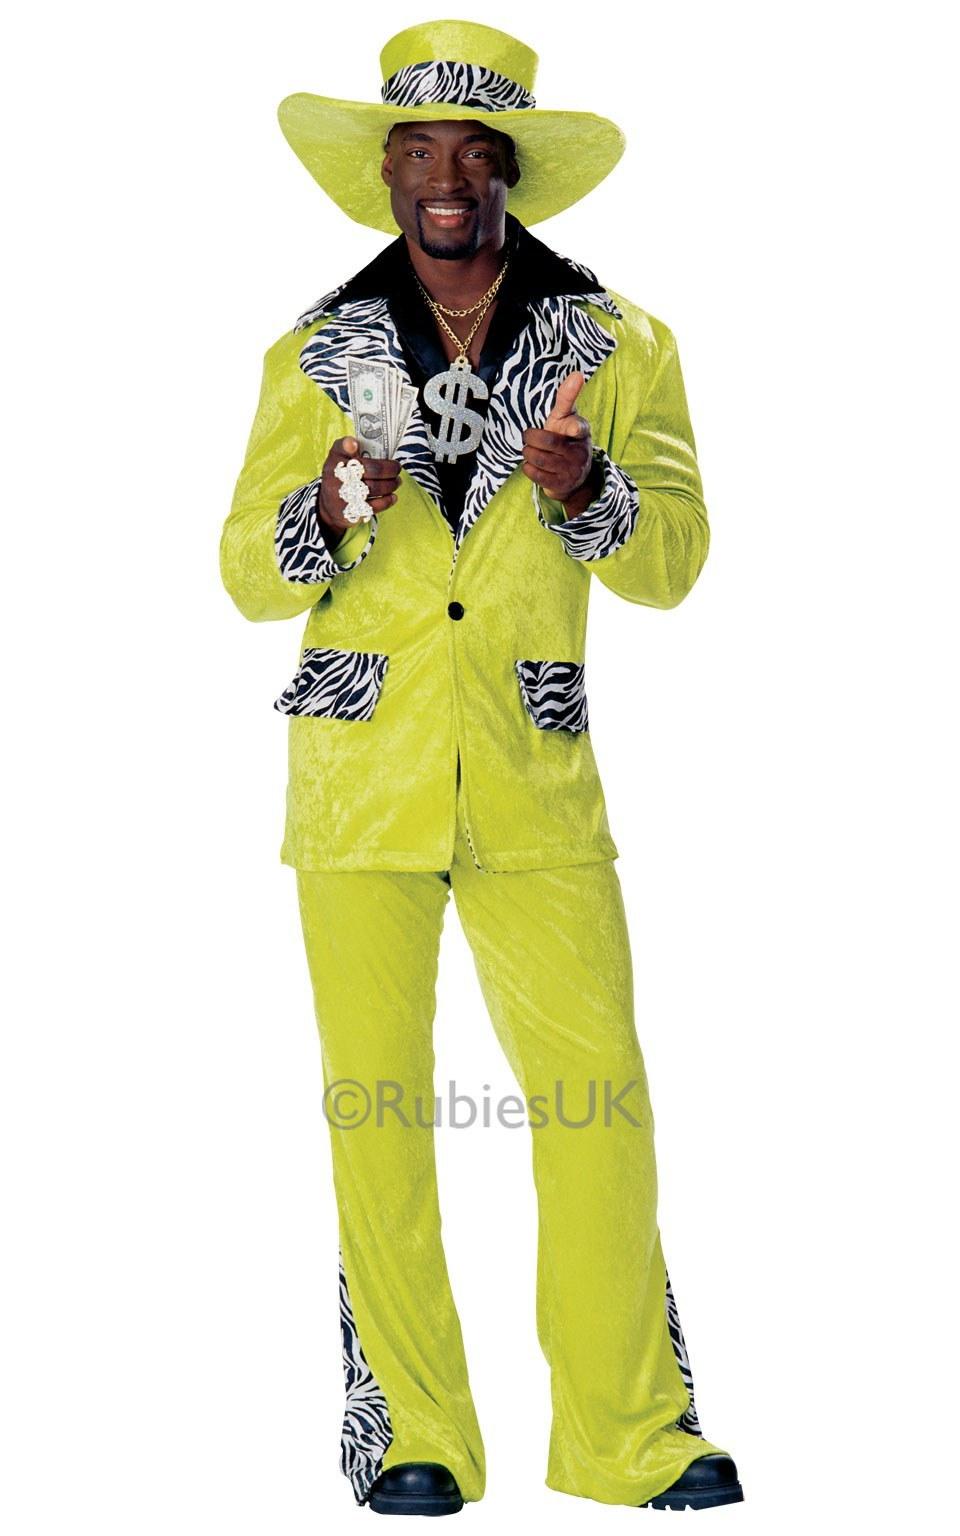 Styles Pimp Costume